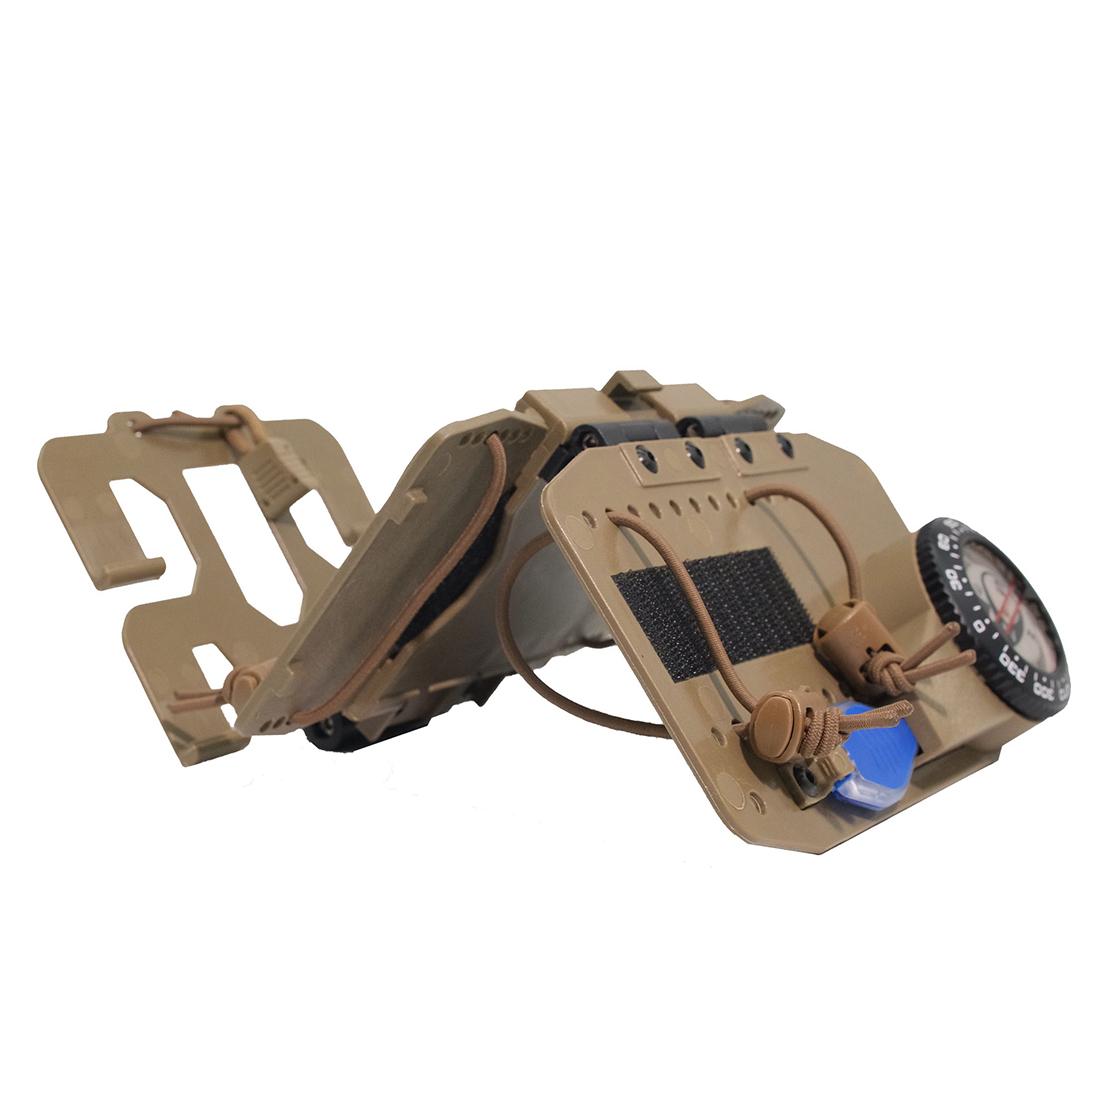 Tactical Equipment Universal Navigation Board Combine Set Skydiving Navigation Board - Tan